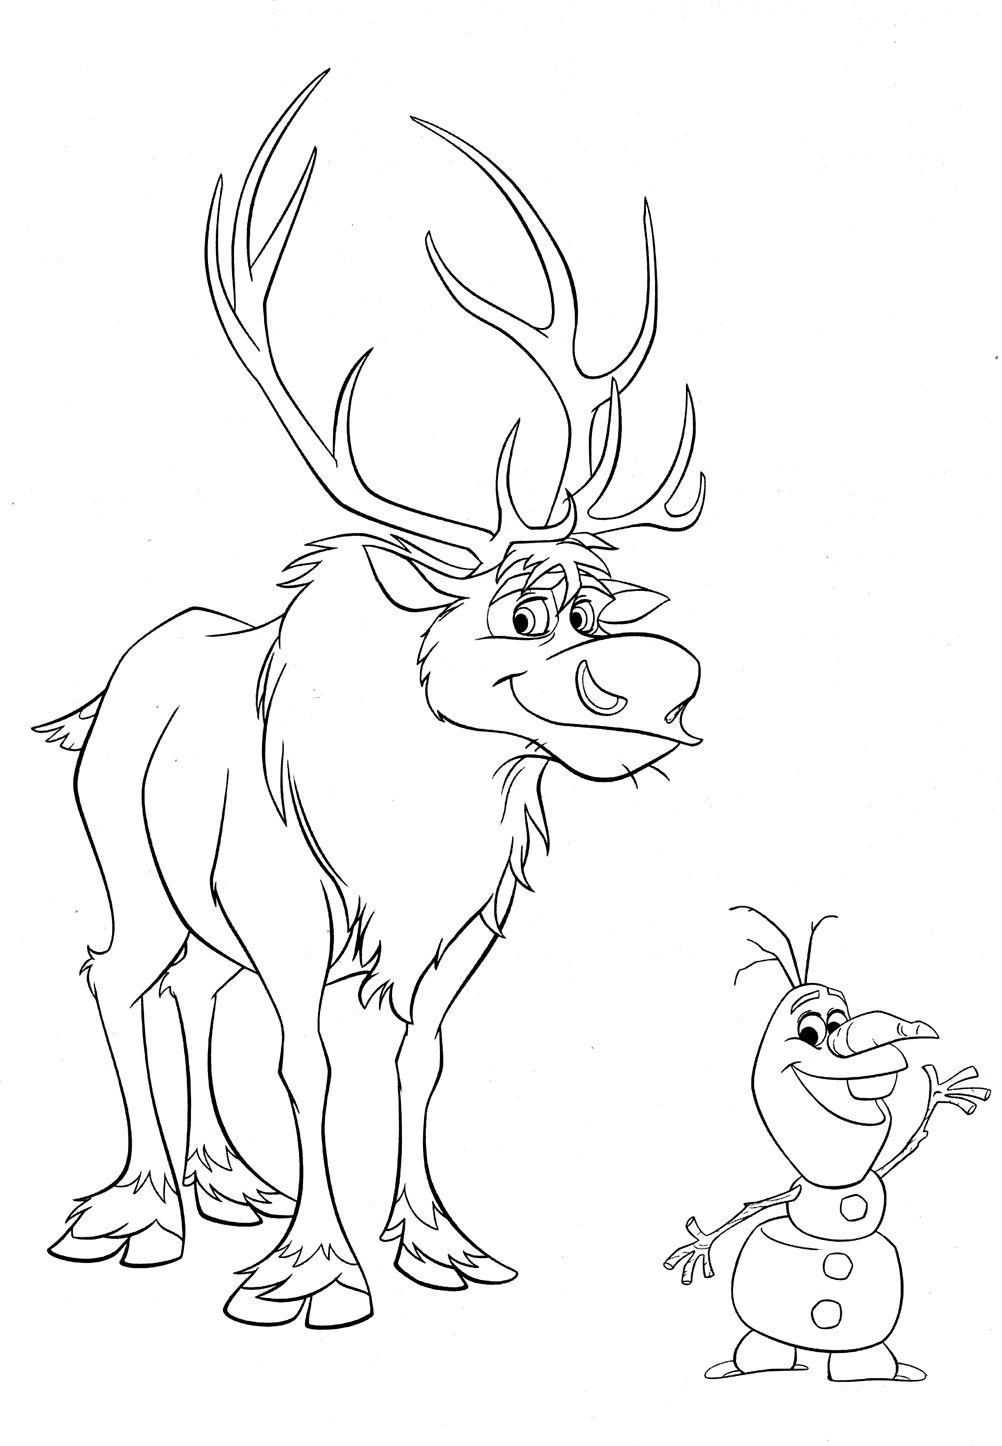 Disney coloring pages coloriages pinterest coloring pages